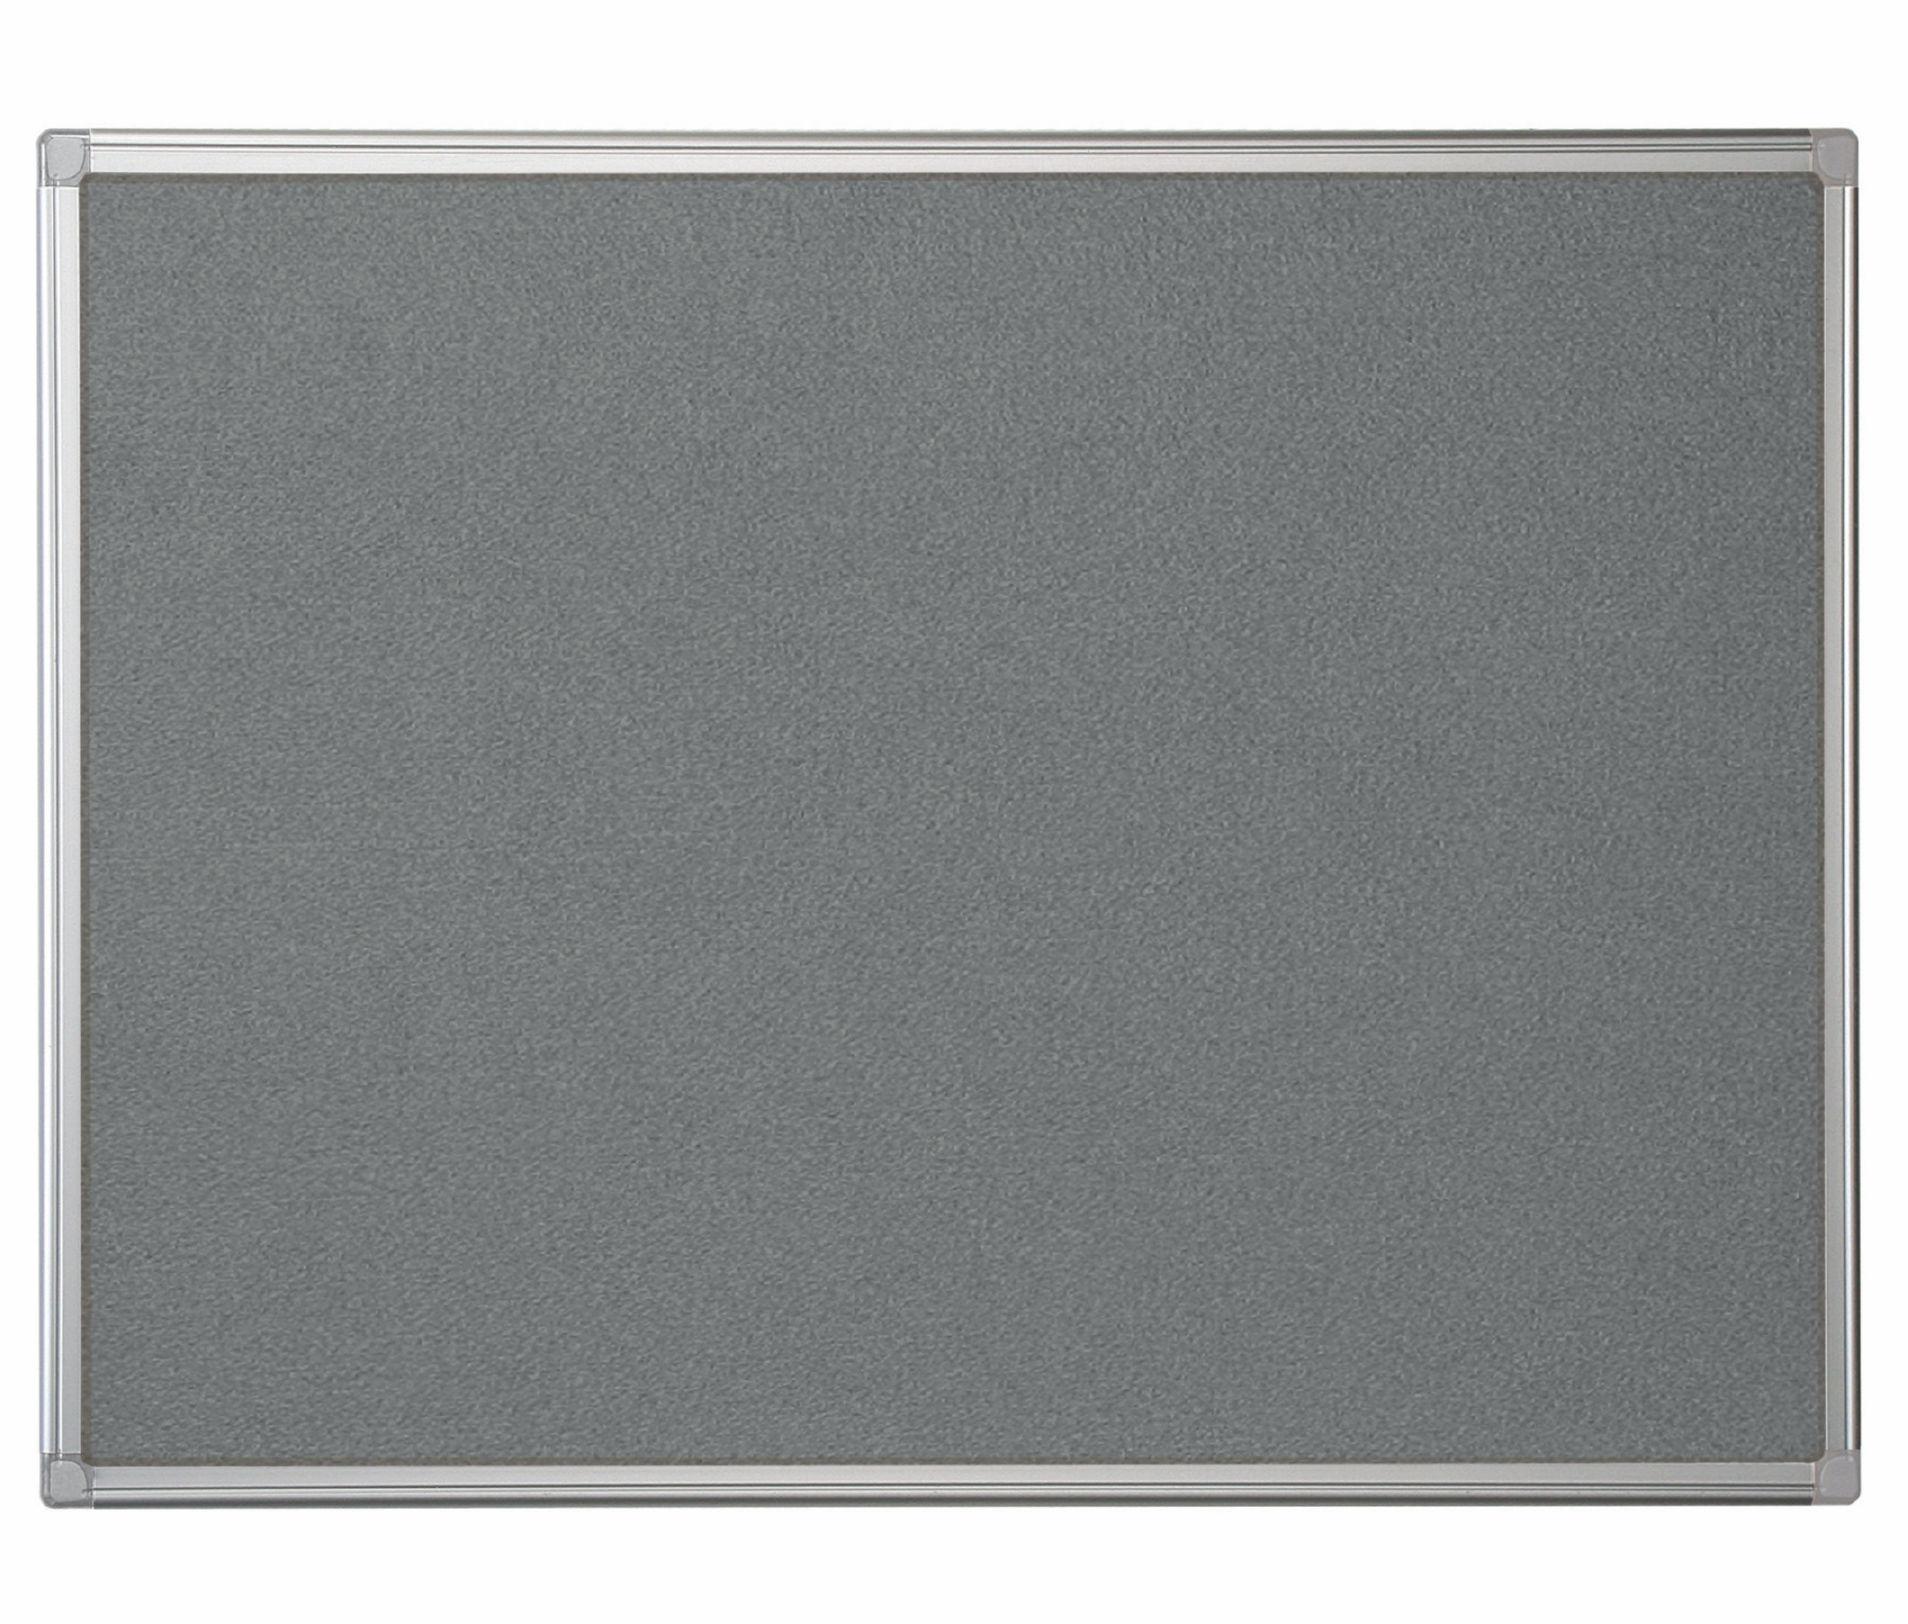 Felt Bi-Office Maya Grey Felt Noticeboard Aluminium Frame 1800x1200mm